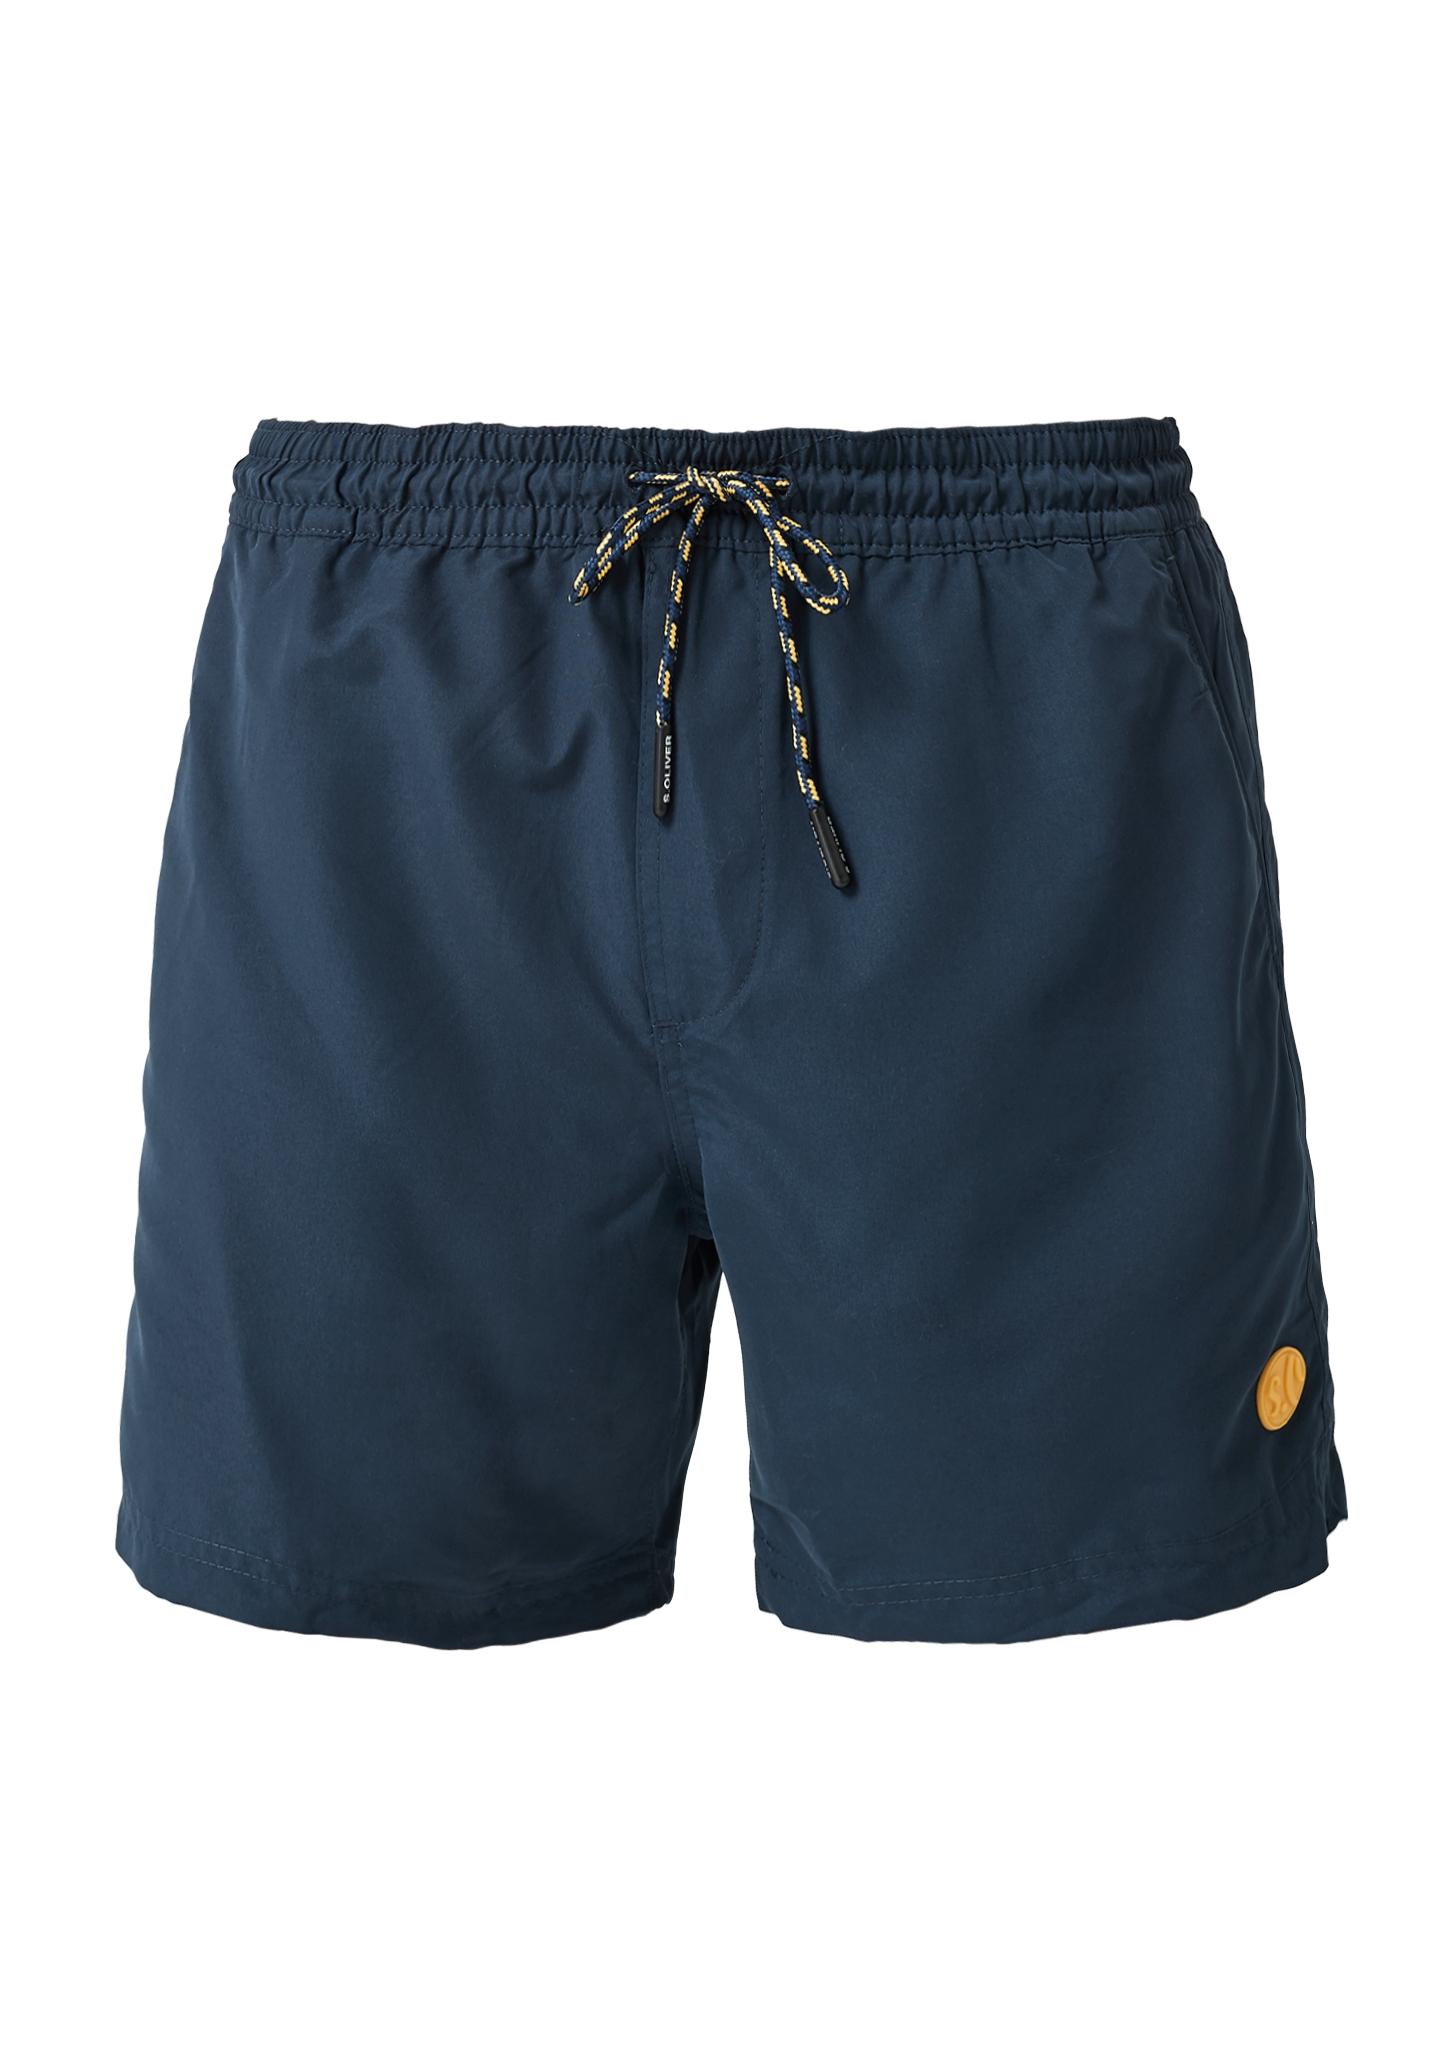 Badehose | Bekleidung > Bademode > Badehosen | Blau | Oberstoff: 100% polyester| futter: 100% polyester | s.Oliver